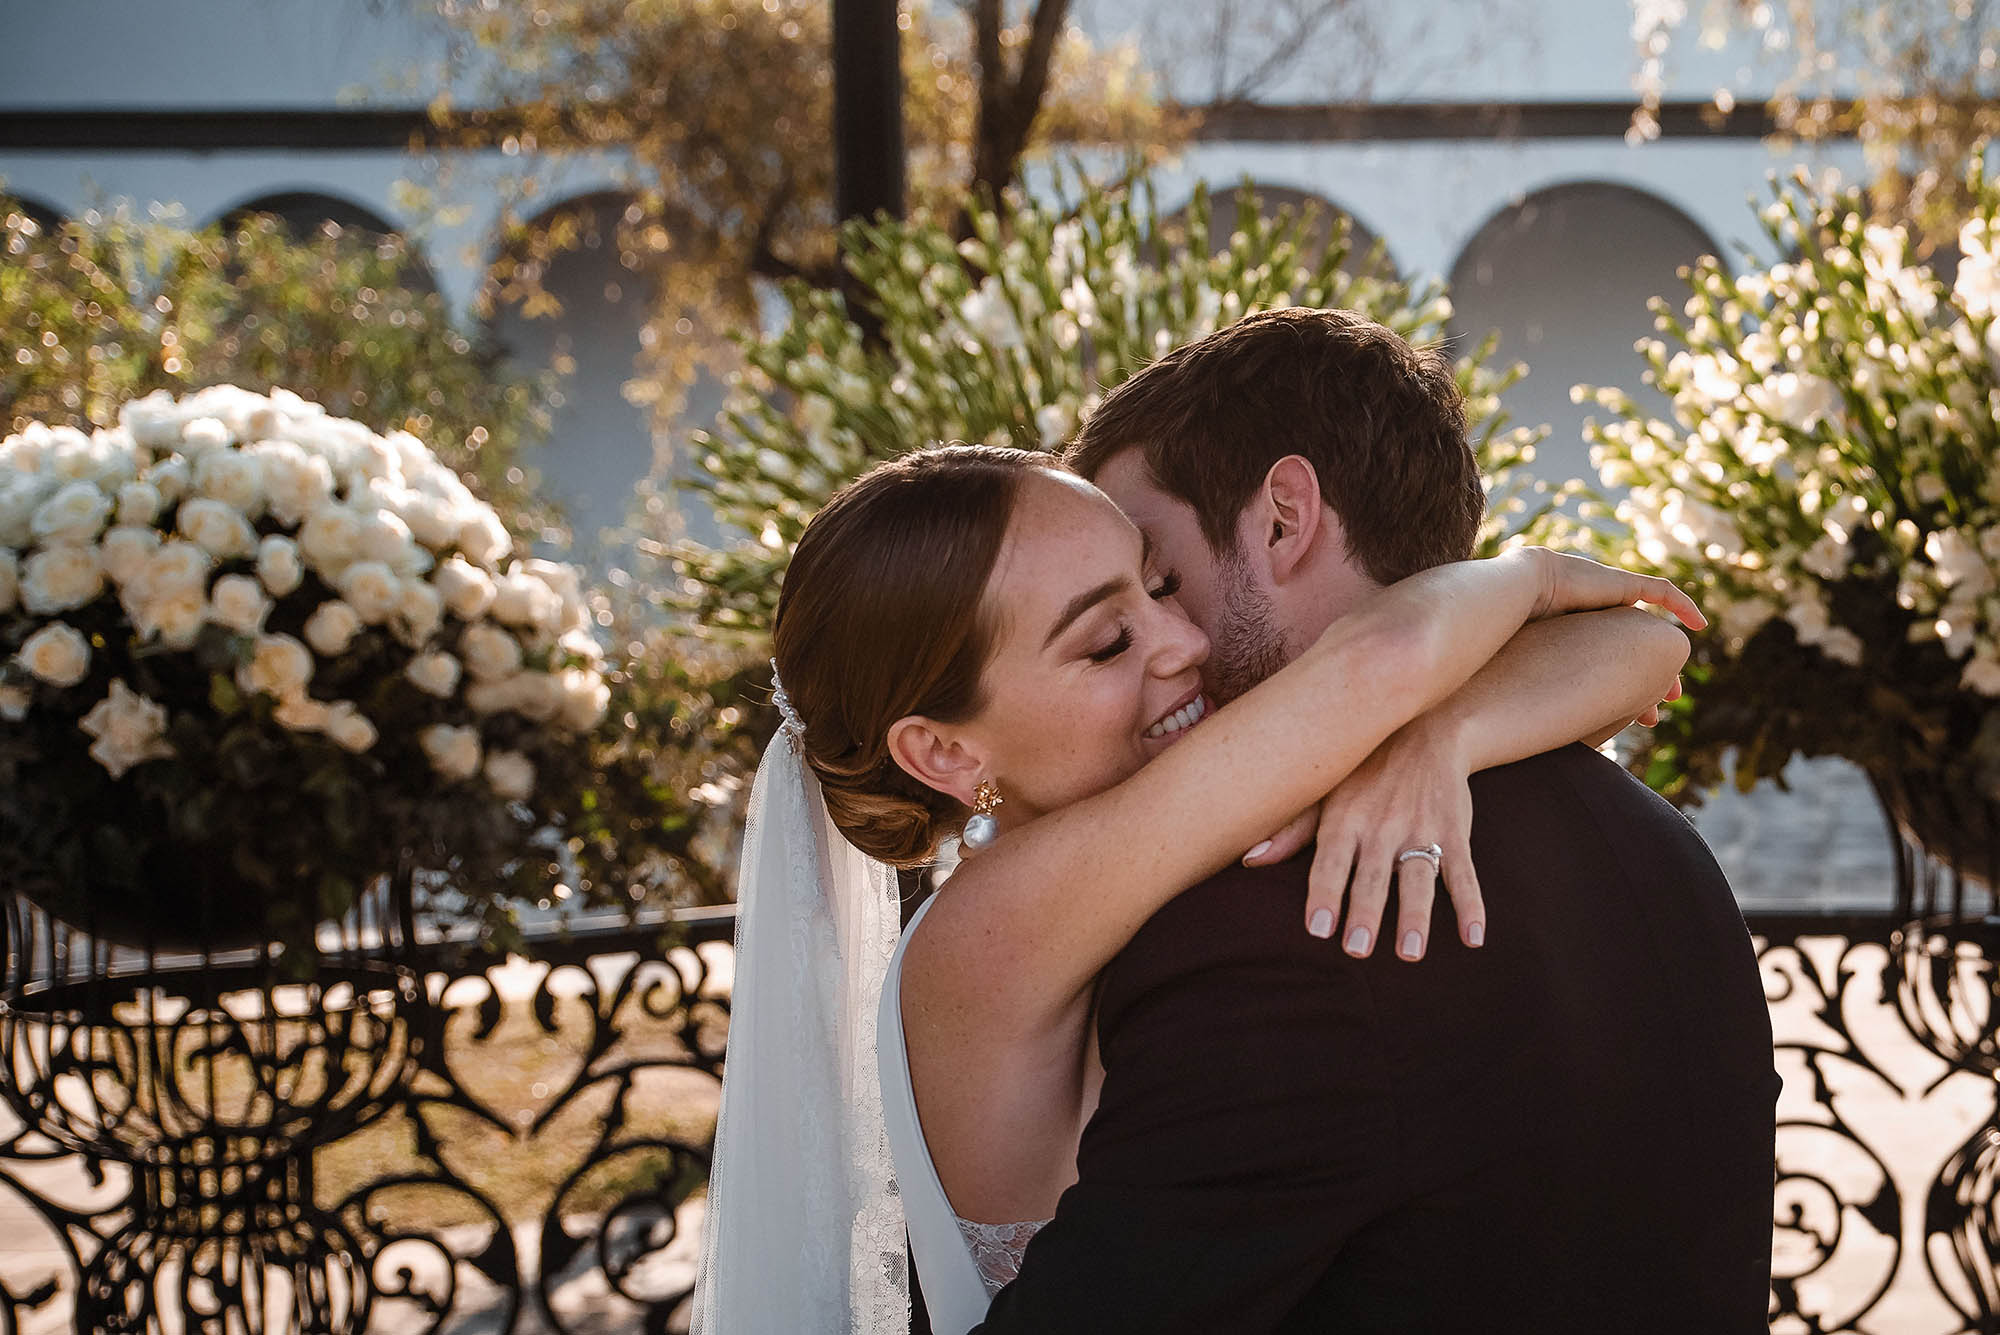 magali fotografo hacienda escoba guadalajara boda wedding 16.jpg